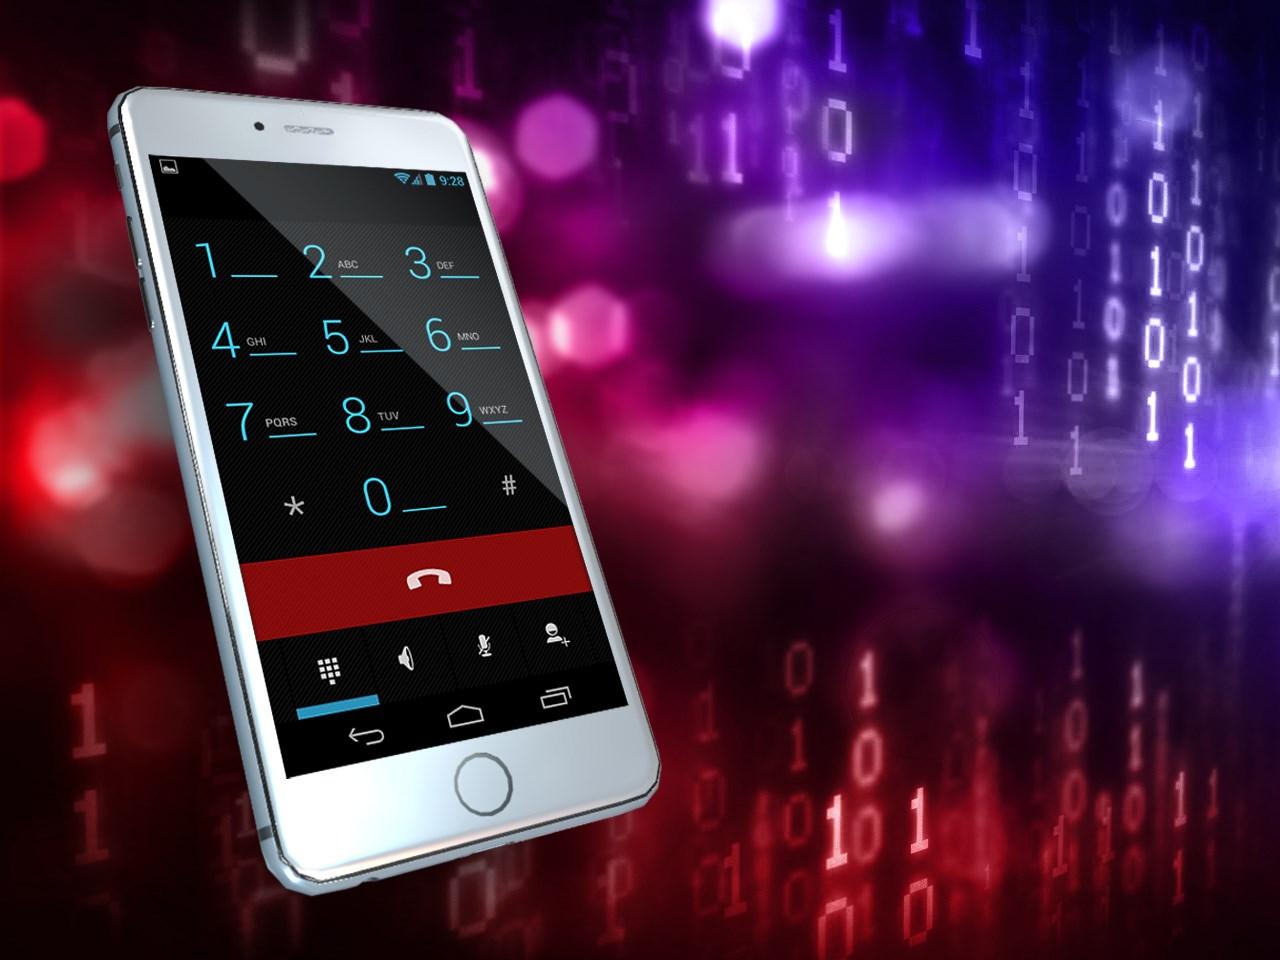 phone scam_1496262240187.jpg